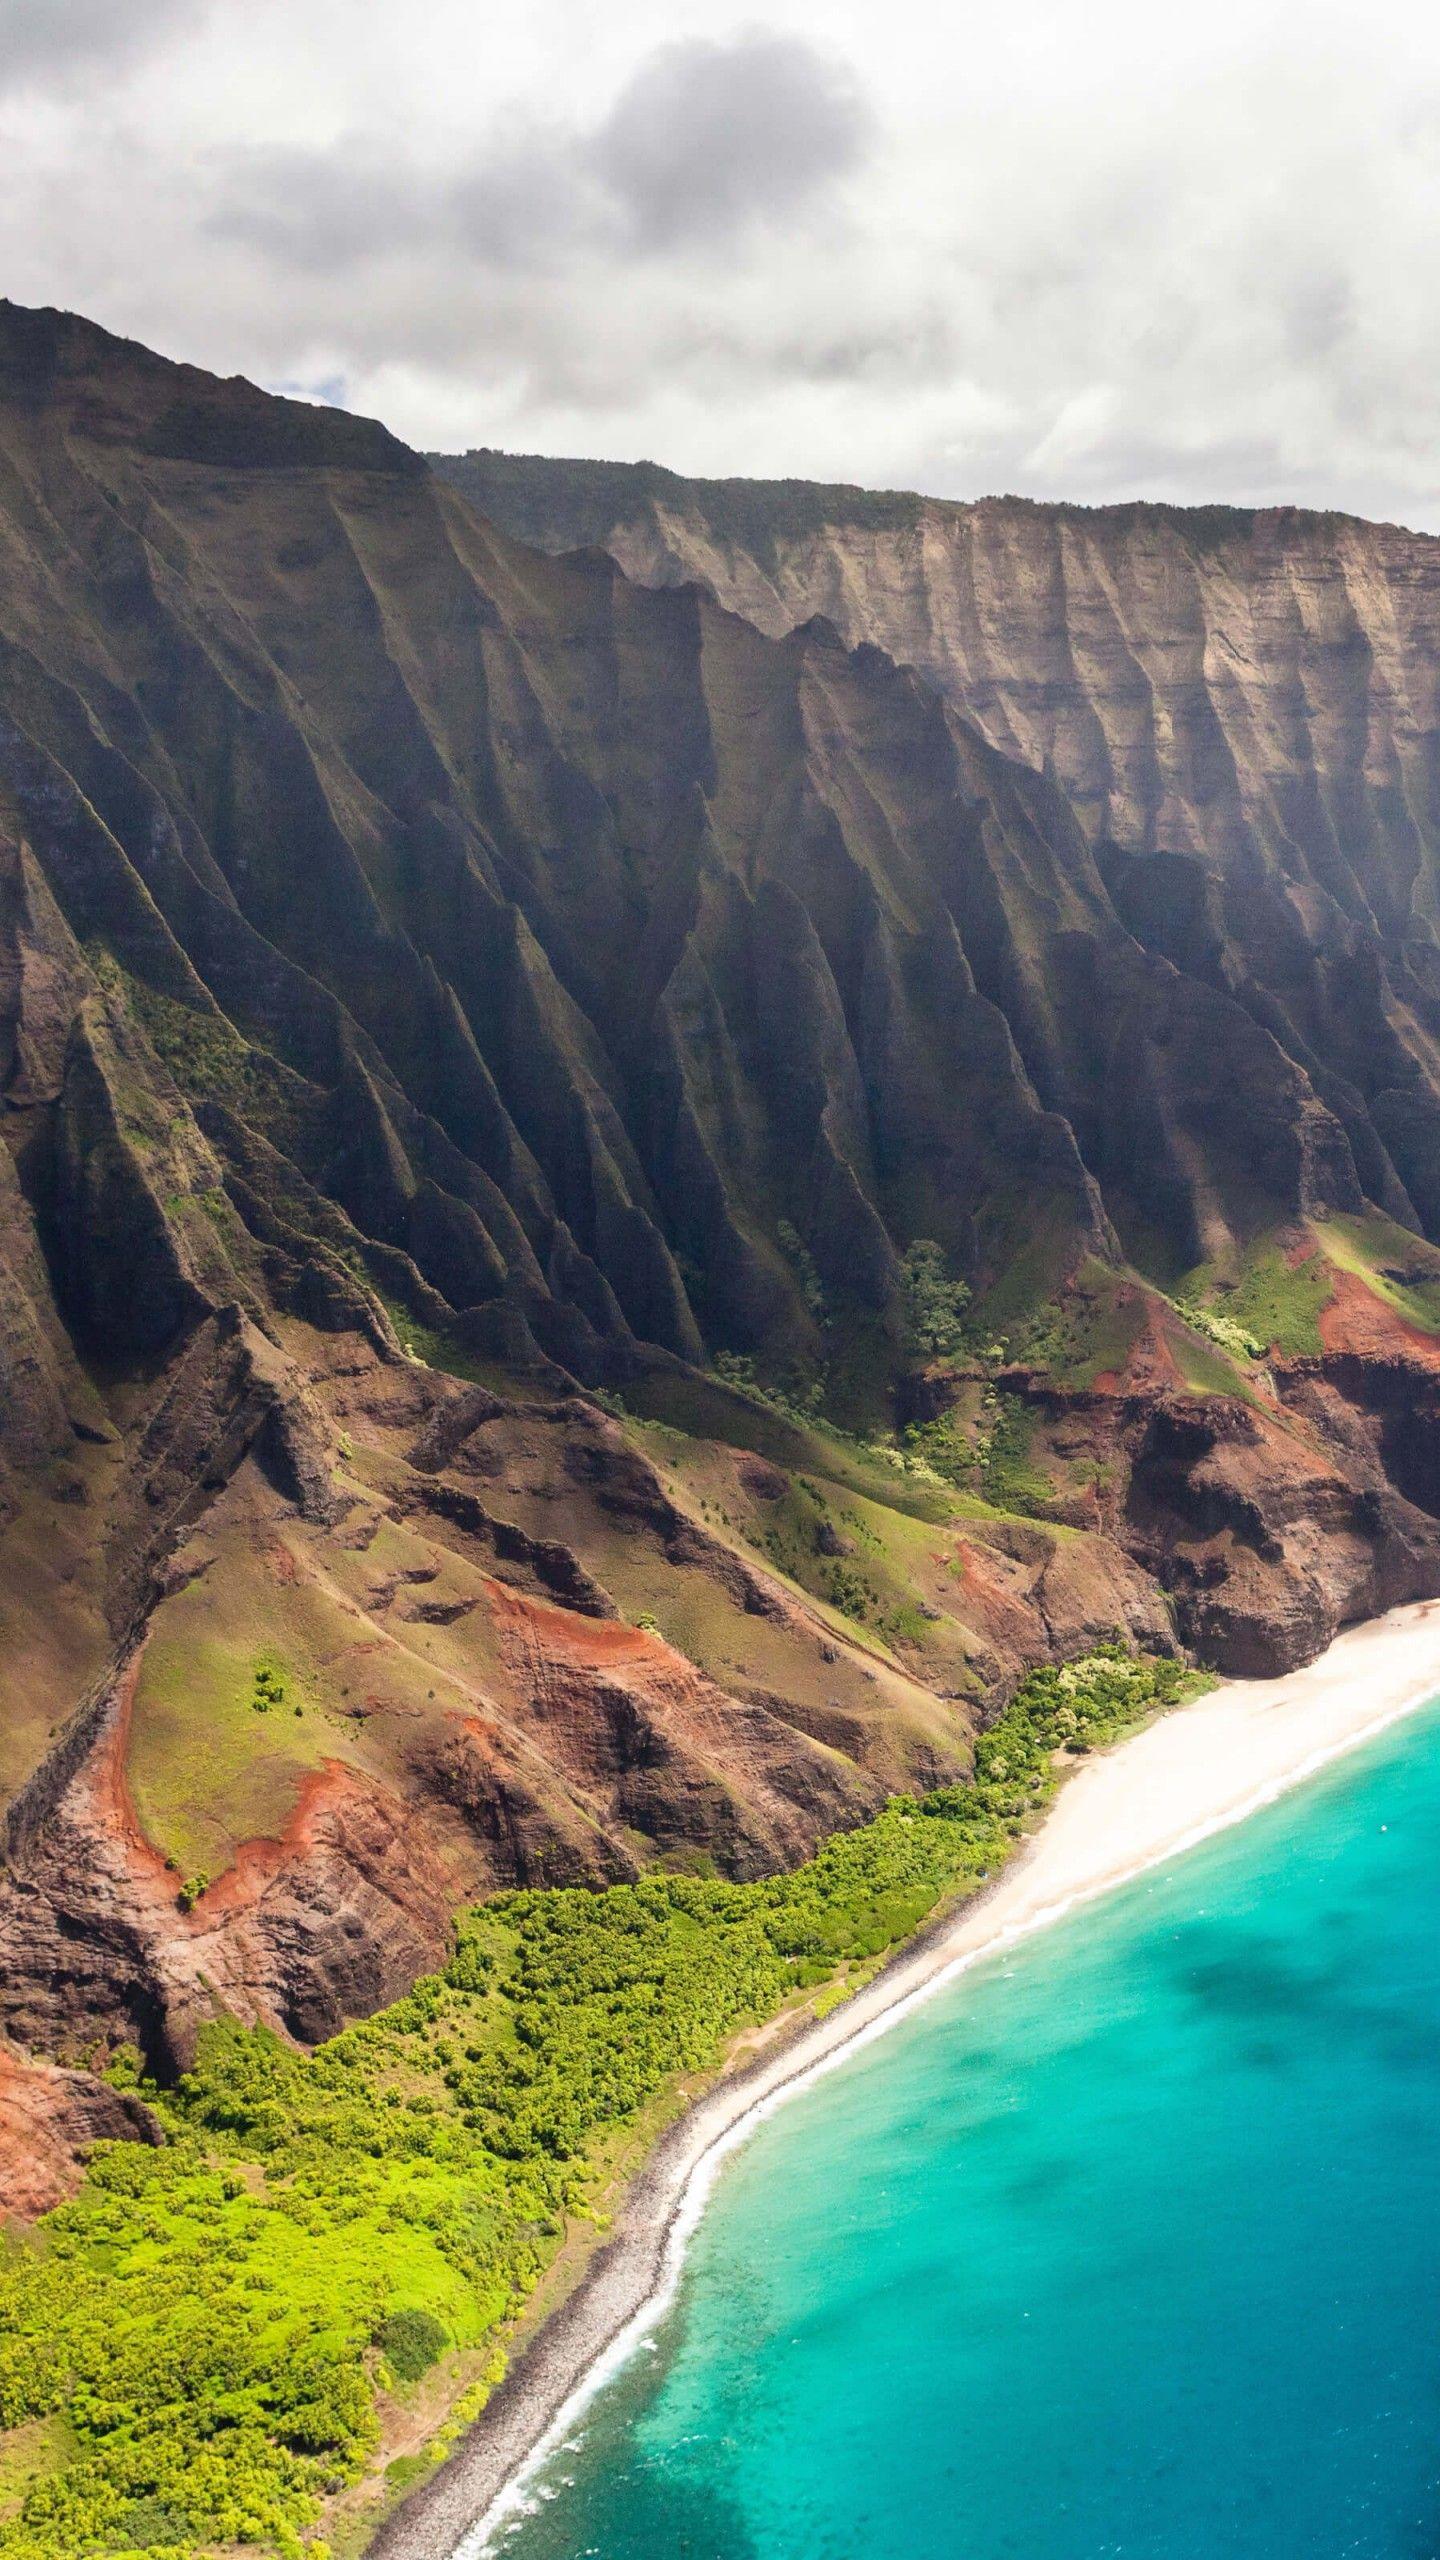 Download Na Pali Coast HD wallpaper for Nexus 6P - HDwallpapers.net